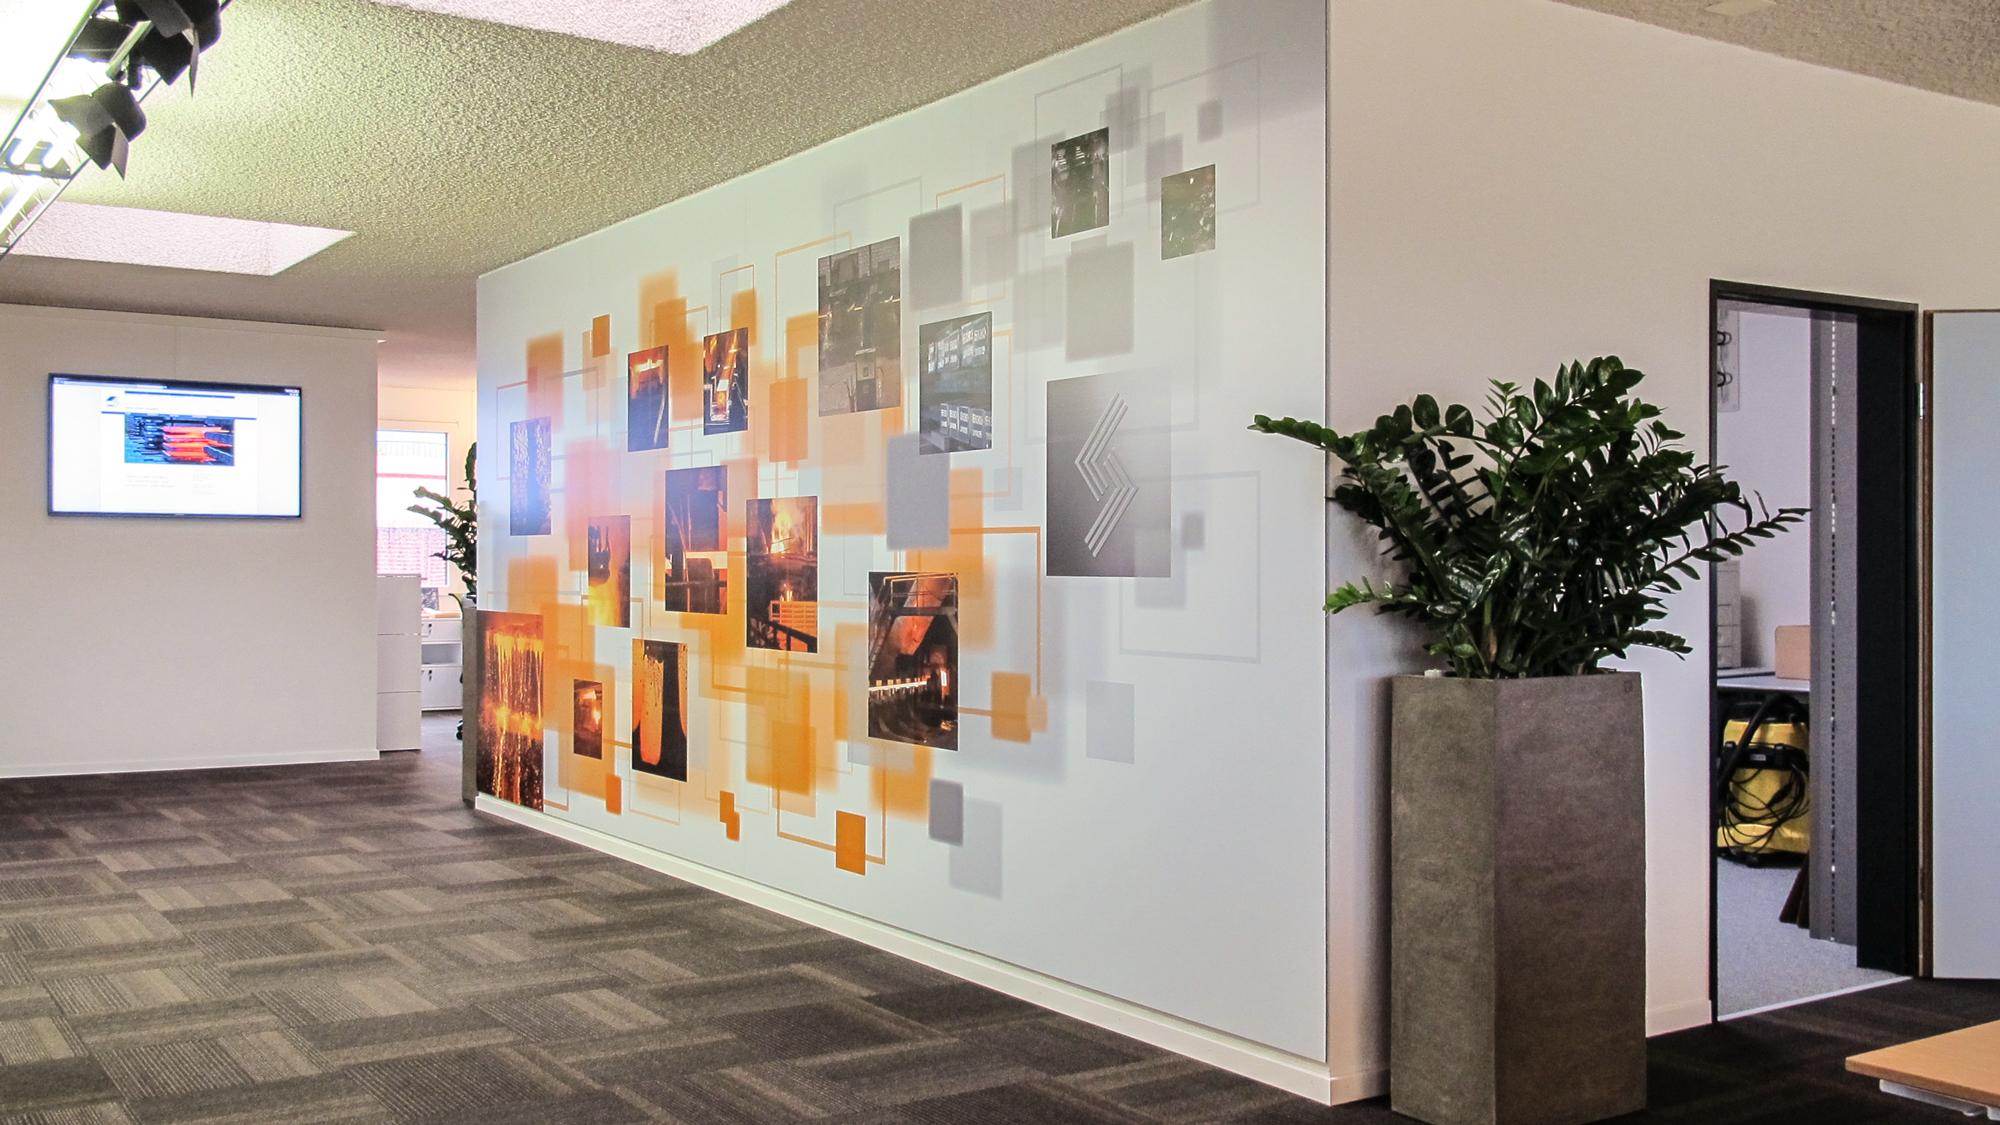 Wandbilder - Wandfolien, Leinwandbilder